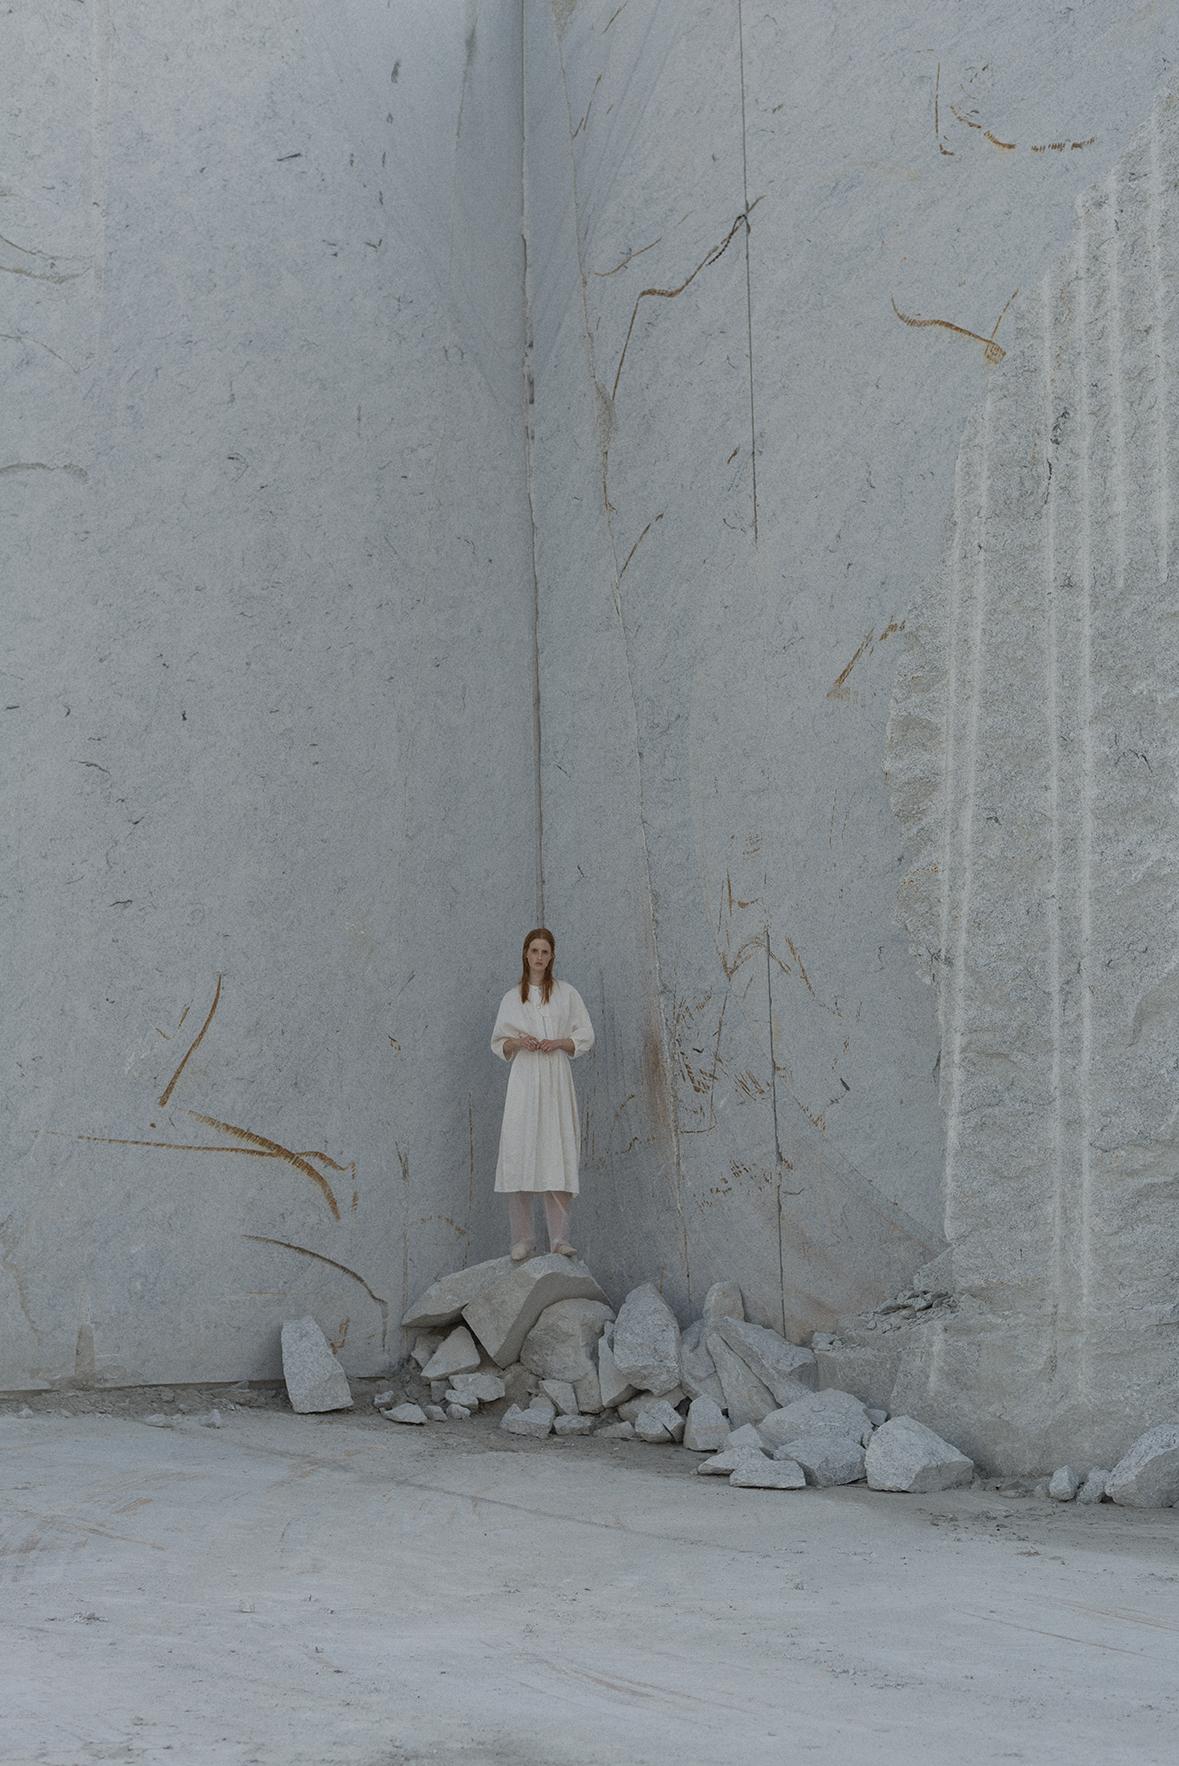 OOO - Mark Jen Hsu / Magdalena Jasek